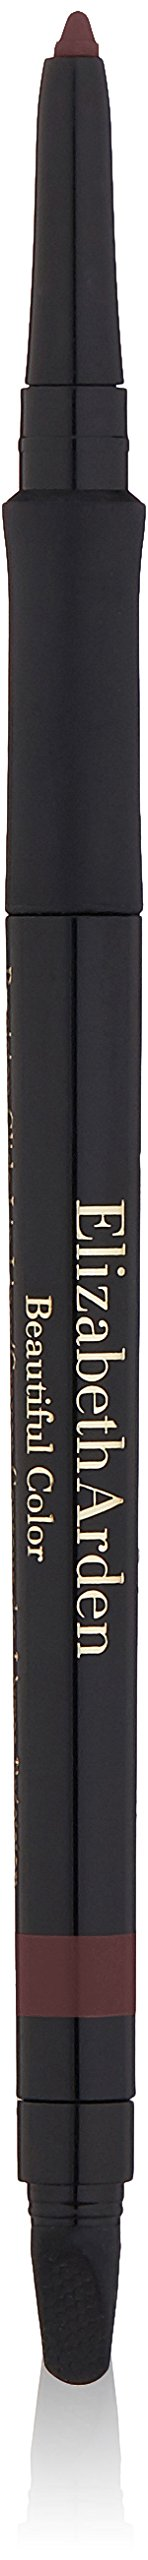 Elizabeth Arden Beautiful Color Precision Glide Lip Liner, Plum Wine, 0.01 oz